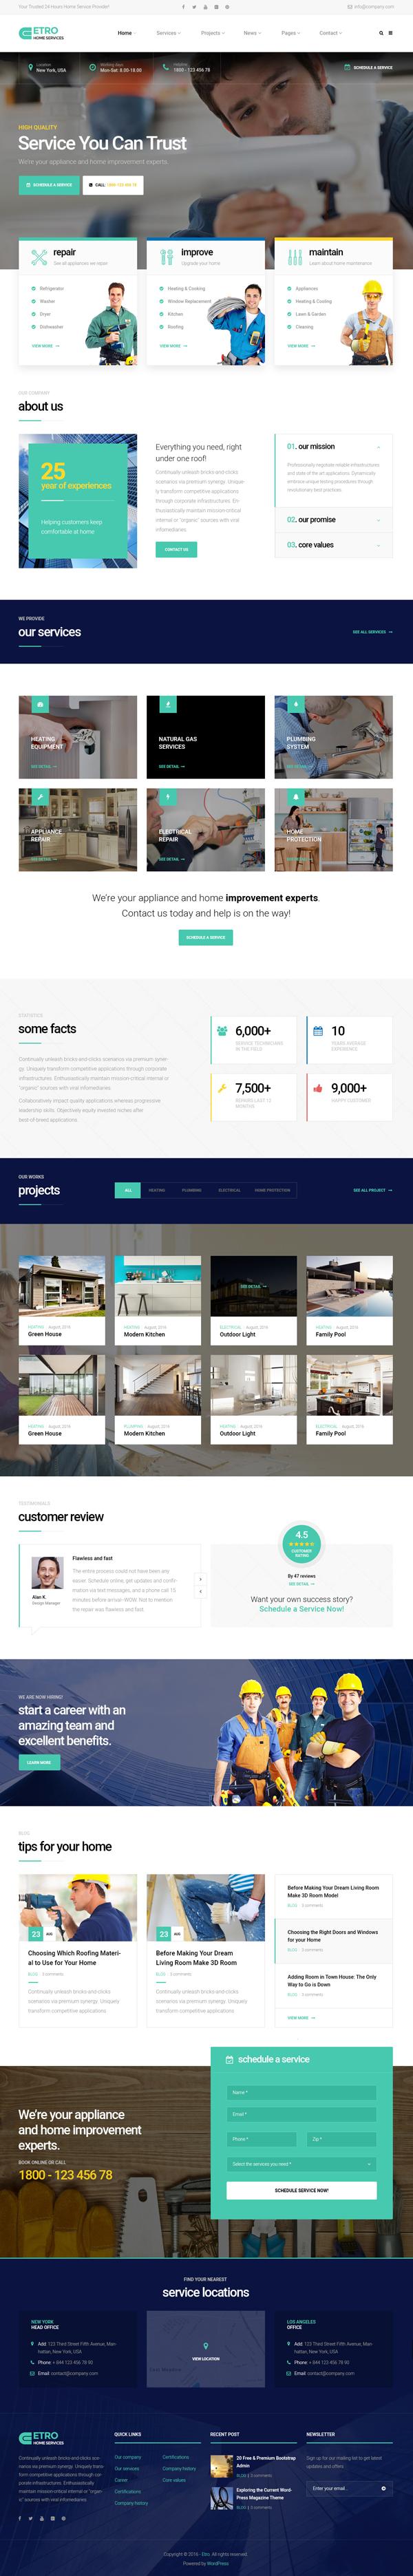 Etro - Home Maintenance, Repair and Improvement Services WordPress Theme